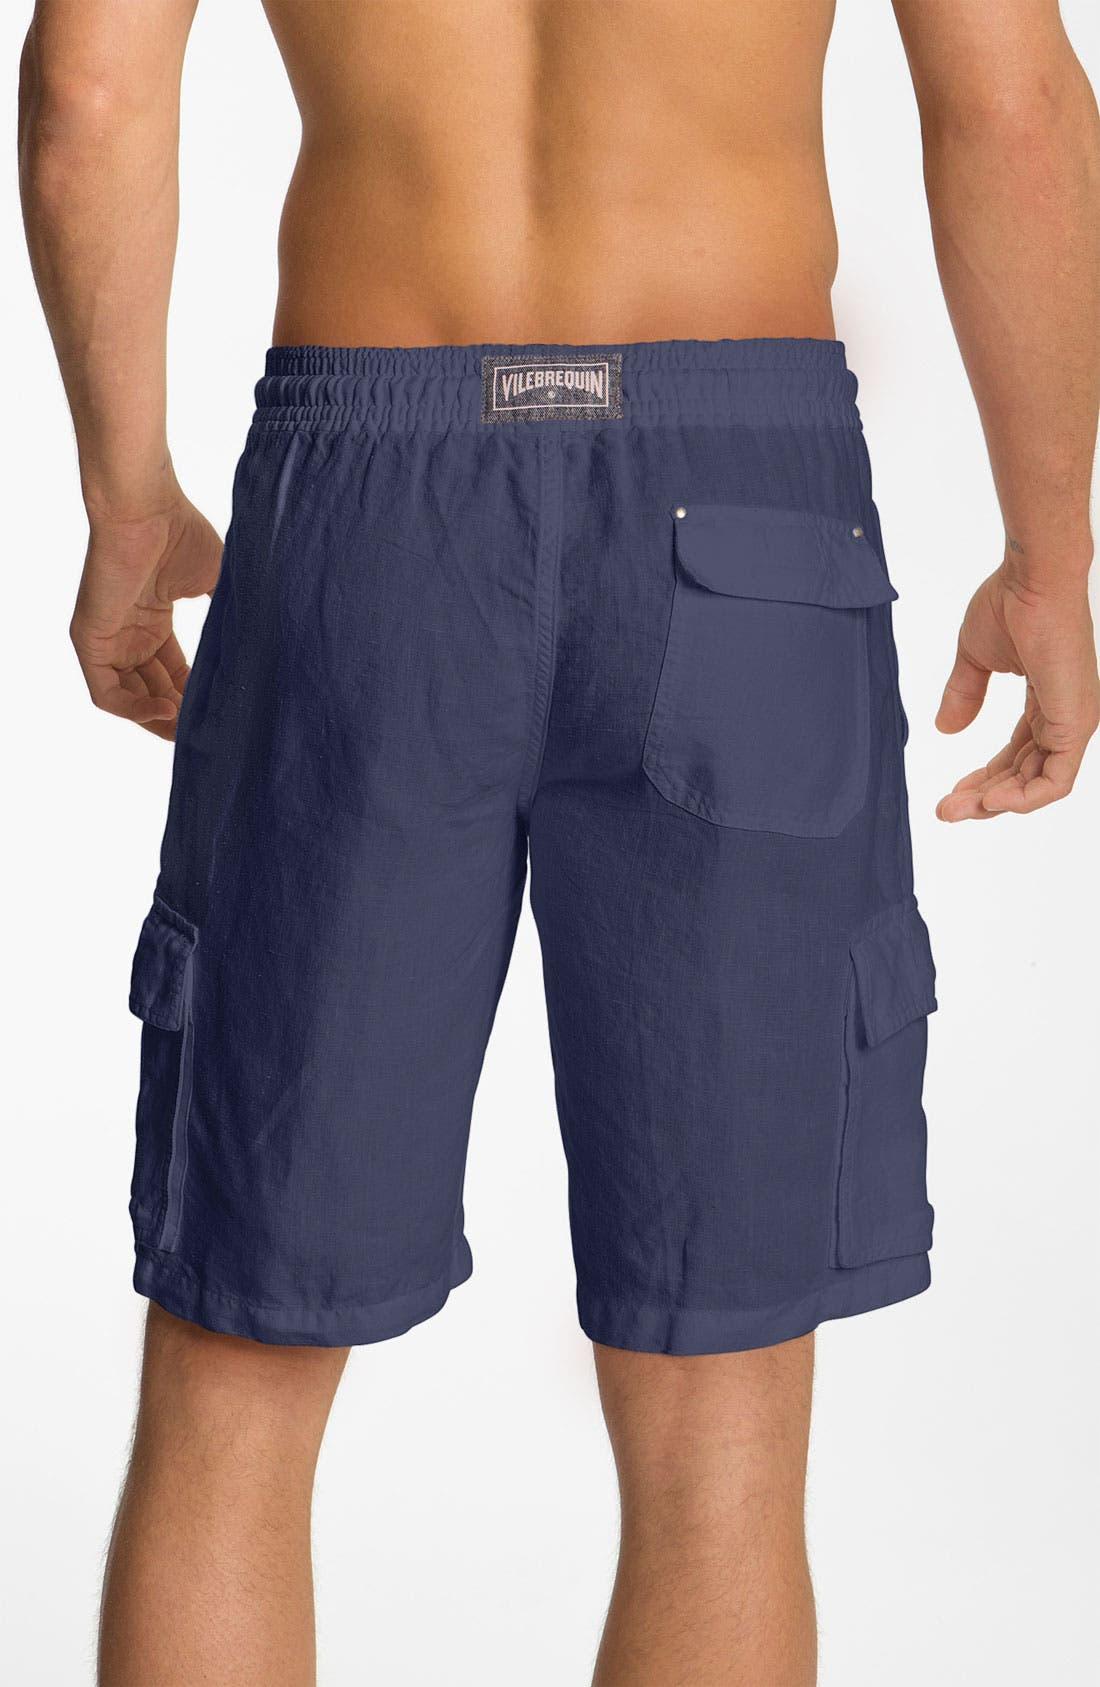 Alternate Image 2  - Vilebrequin 'Baie' Linen Shorts